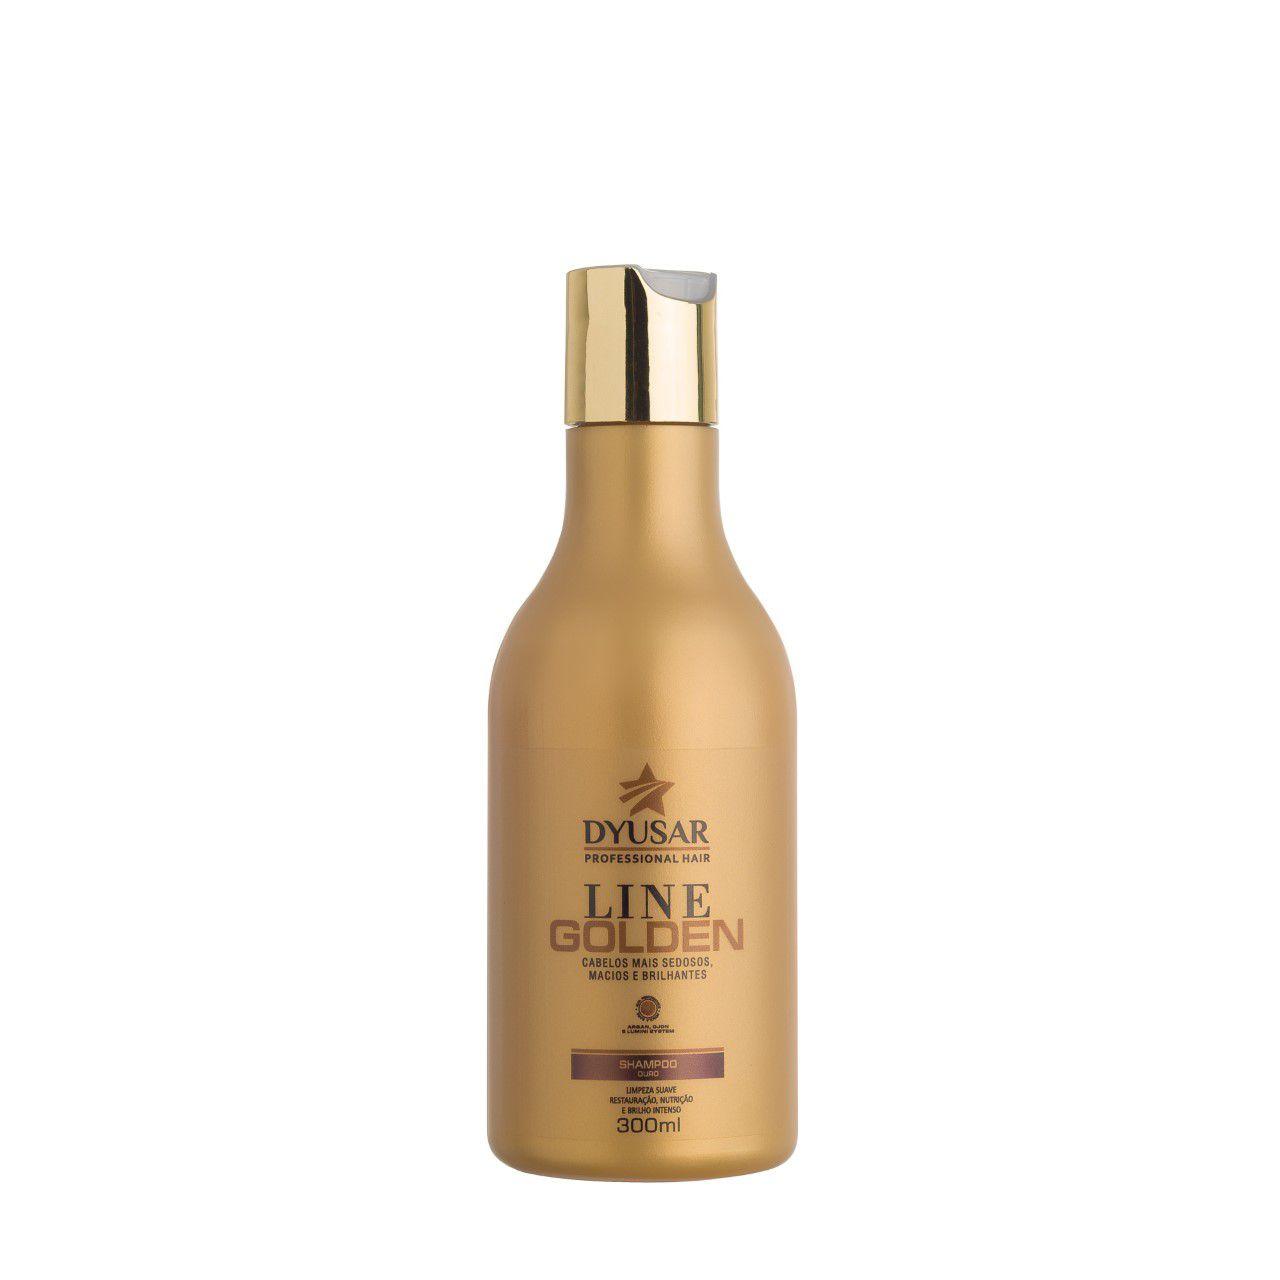 Shampoo Ouro Line Golden Profissional Hair DYUSAR 300 ml